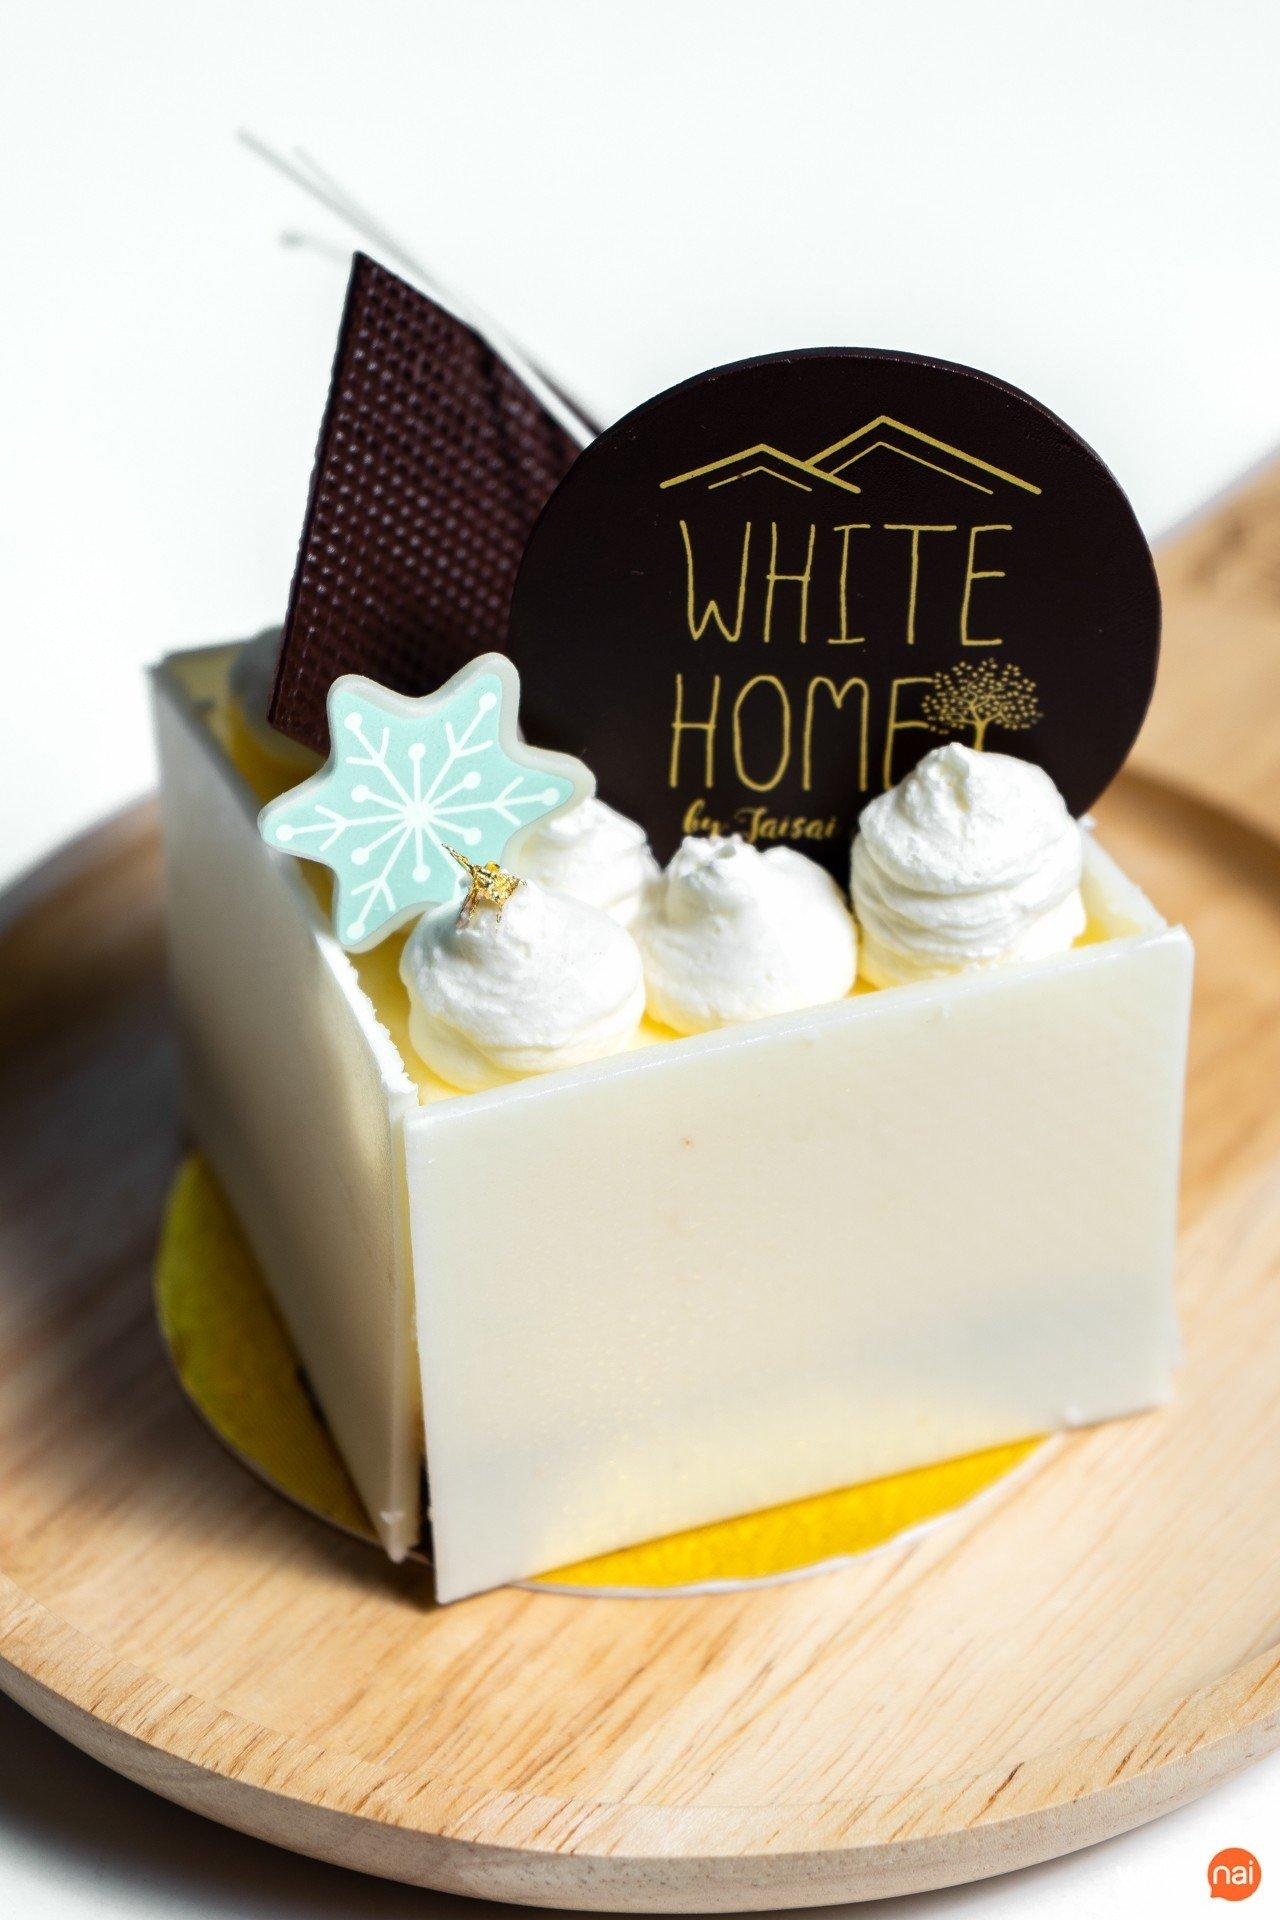 White Home Cafe , ร้านขนมปังเชียงใหม่ , คาเฟ่เชียงใหม่